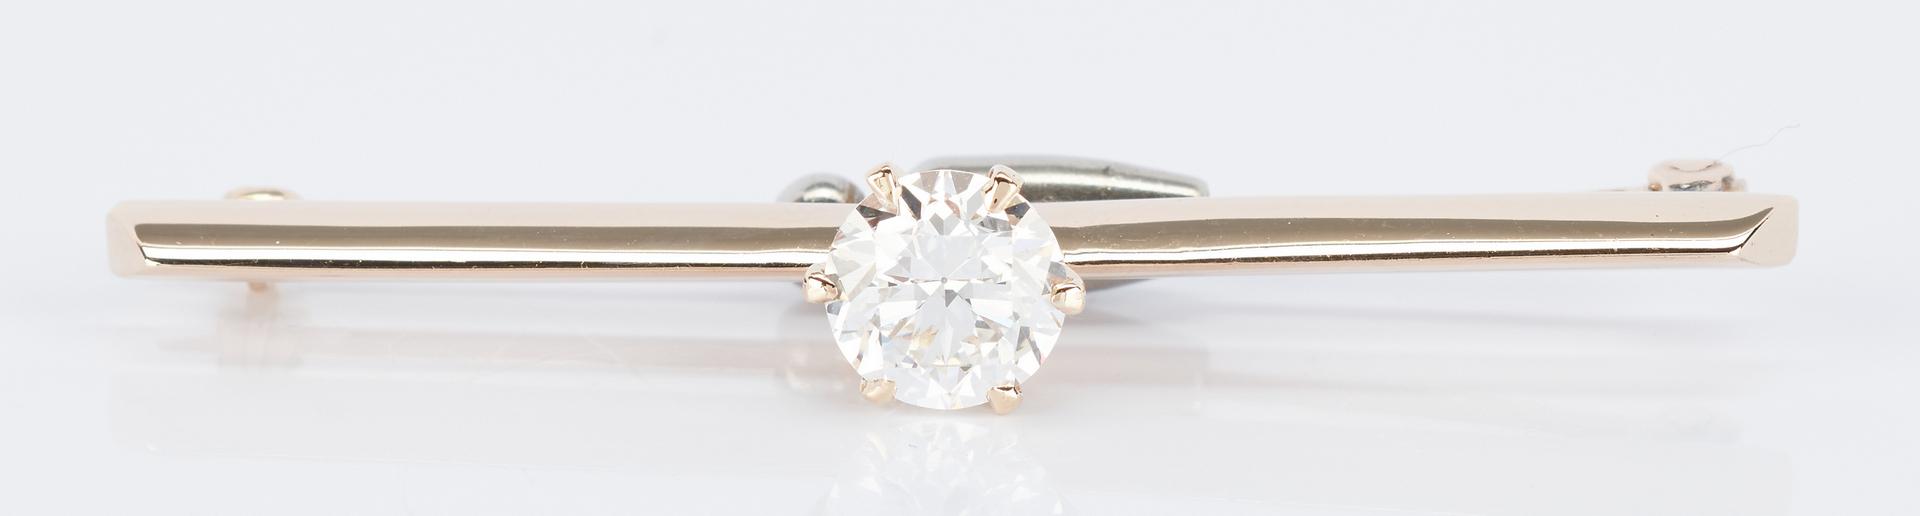 Lot 34: Ladies Antique 14K Diamond Bar Pin